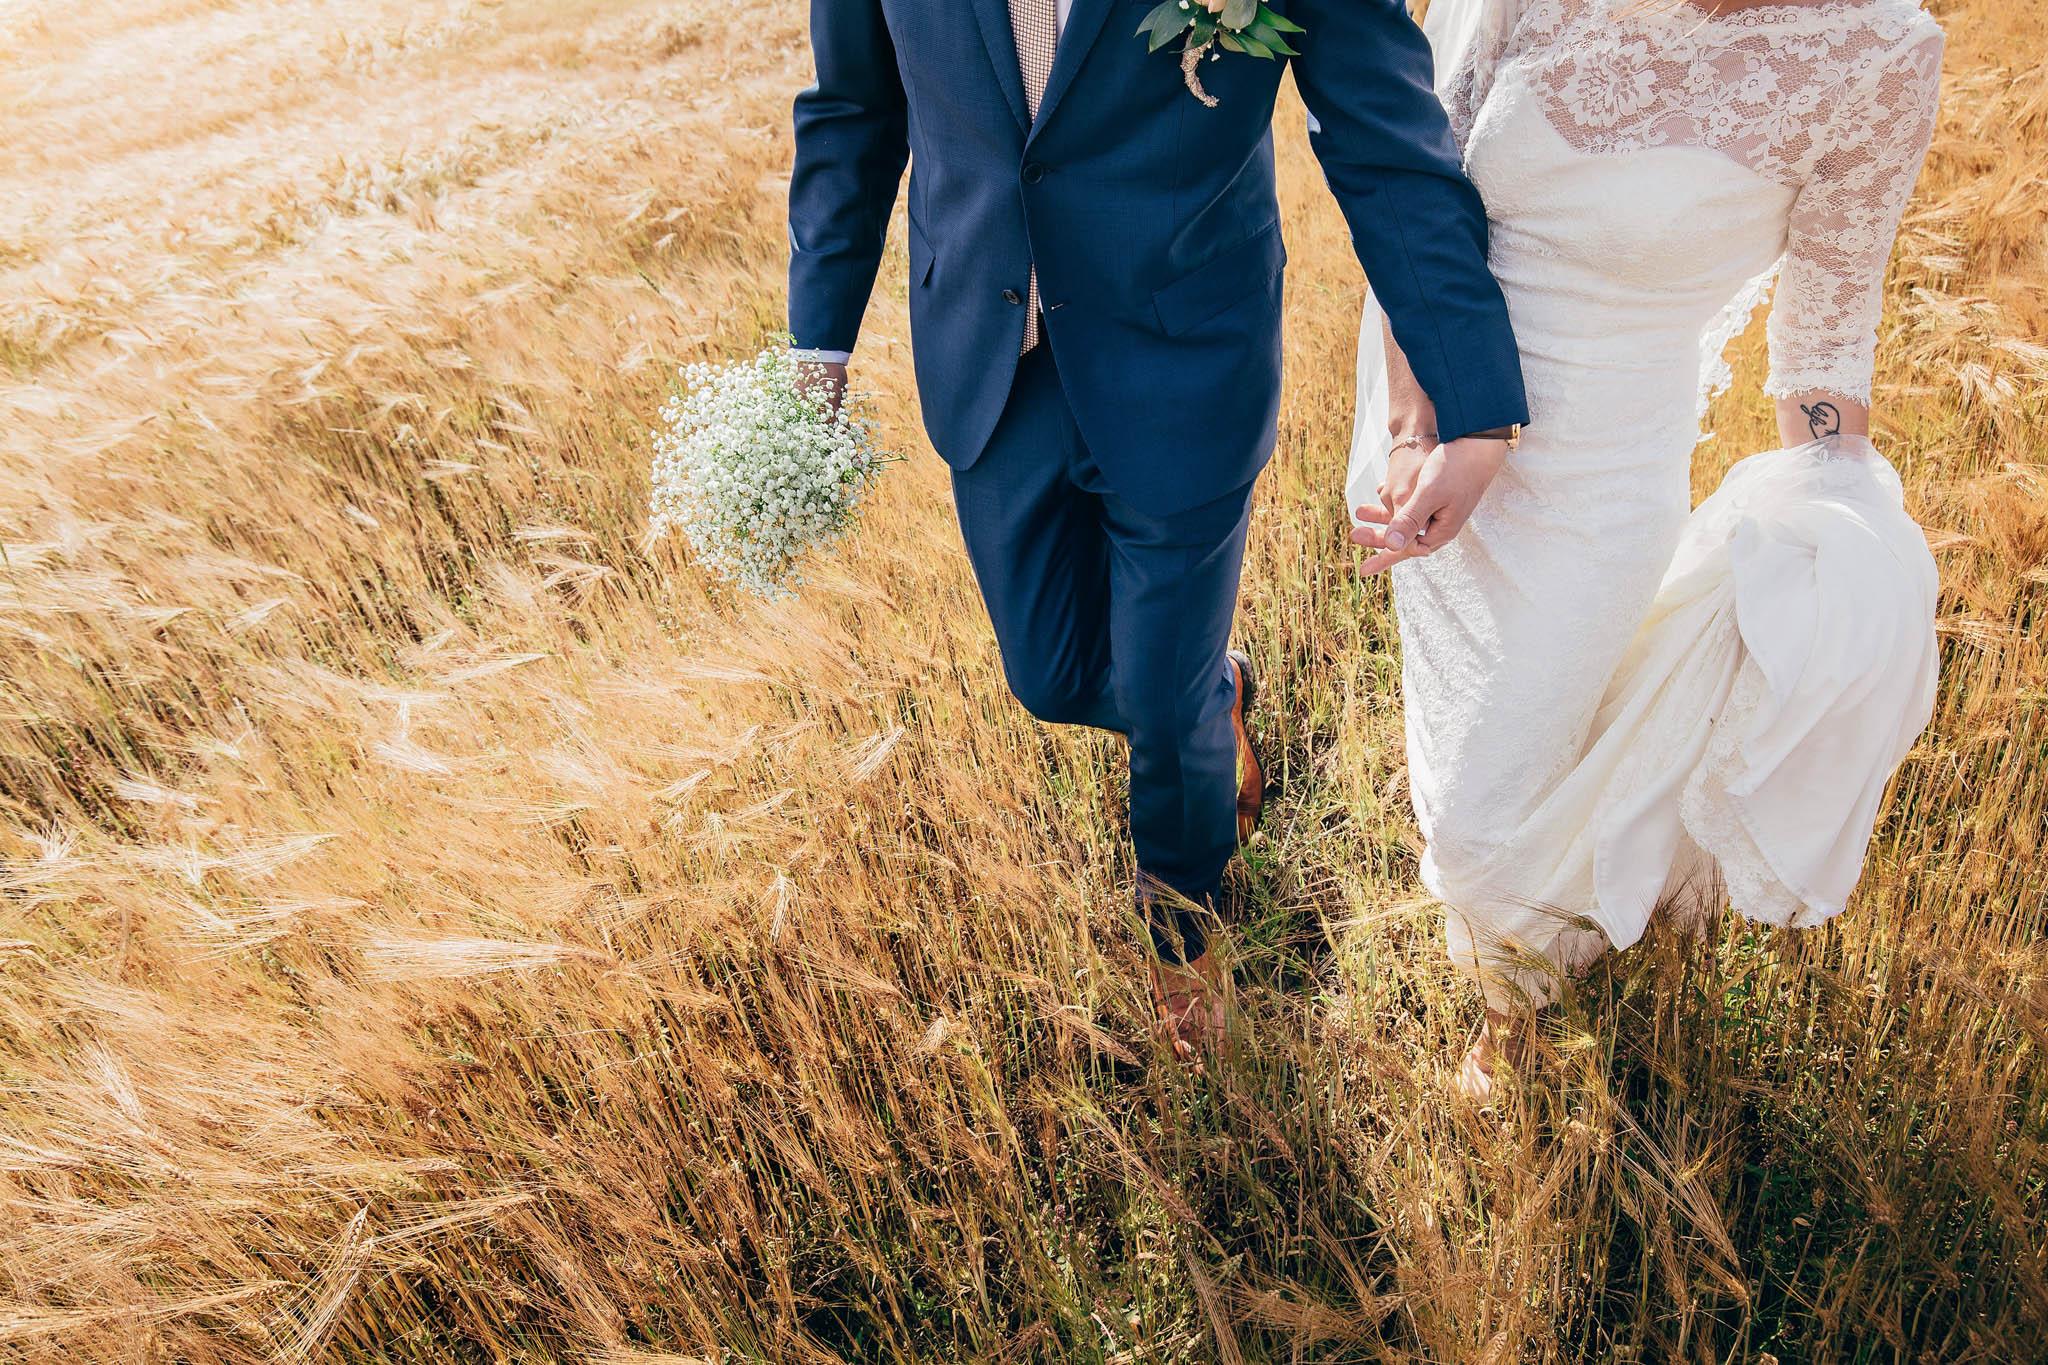 Norway+wedding+photographer+elopement+pre+wedding+Casey+Arneson-87.jpg